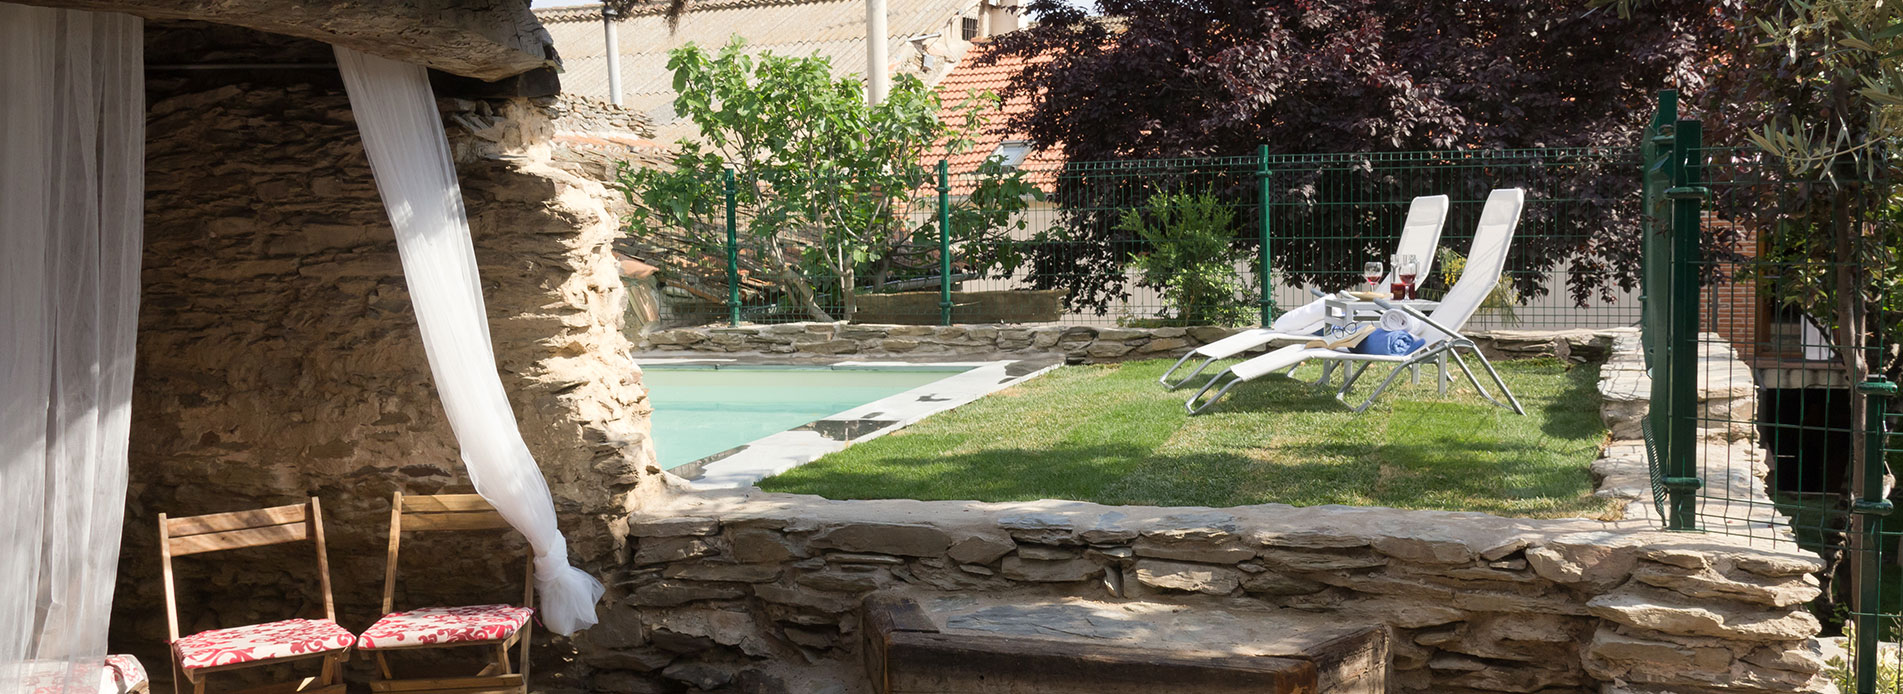 slider7-estancias-rurales-charming-hotels-segovia